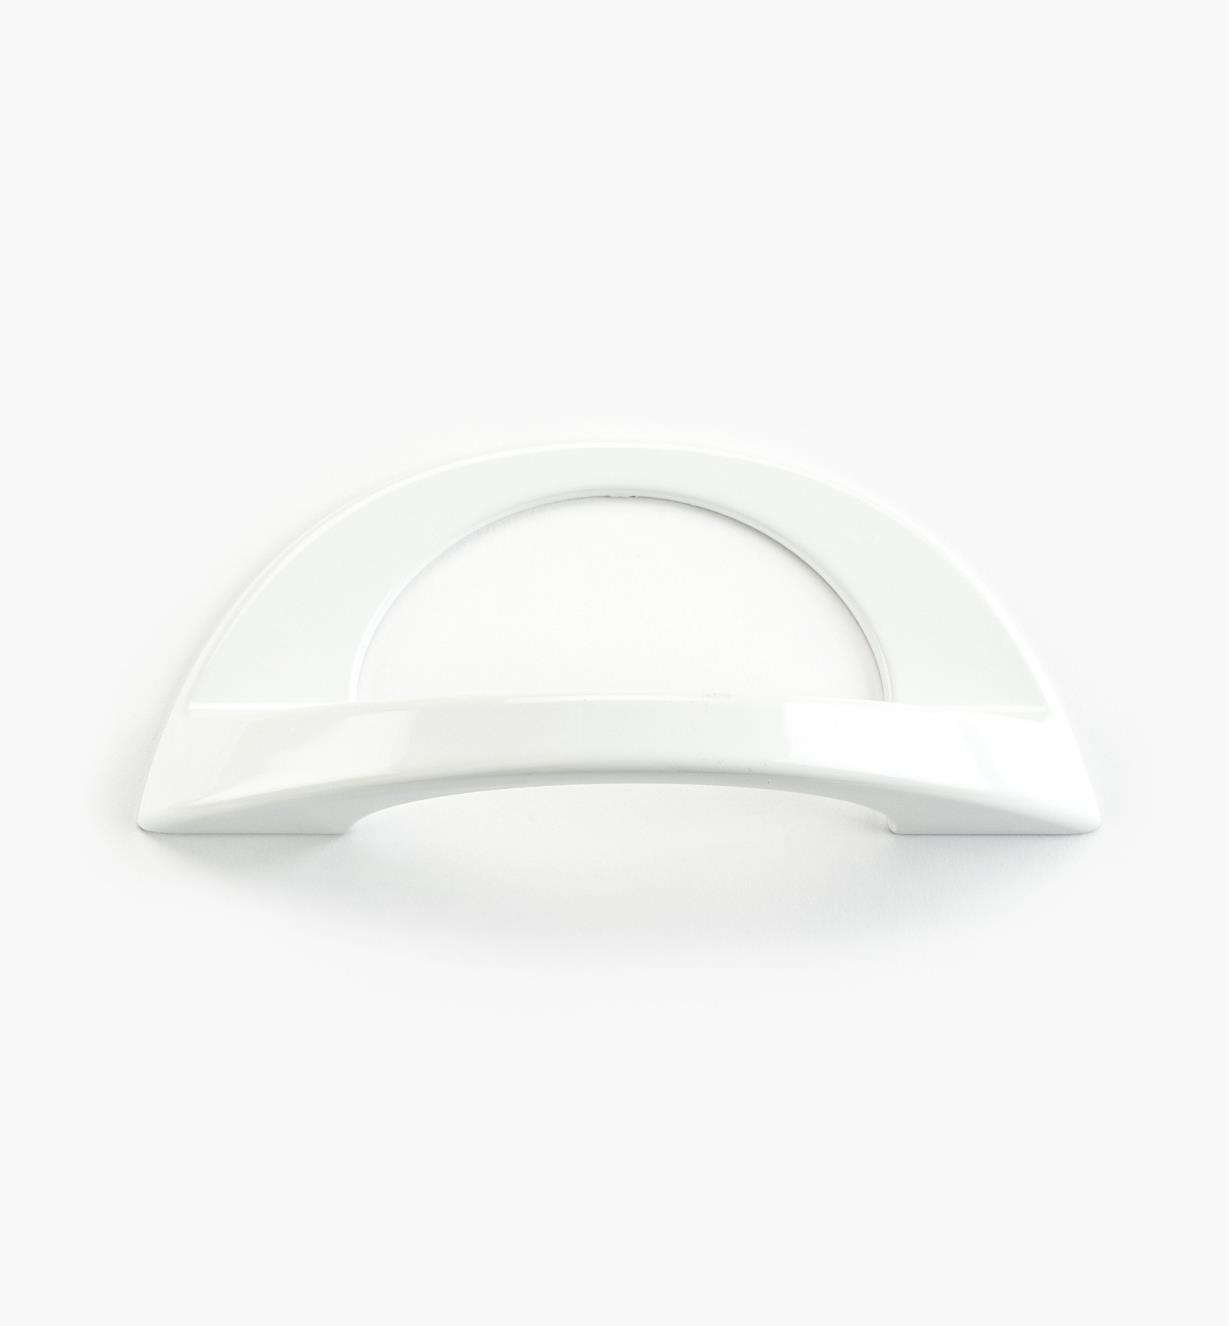 01W0862 - Poignée Polo, fini blanc, 128 mm × 43 mm